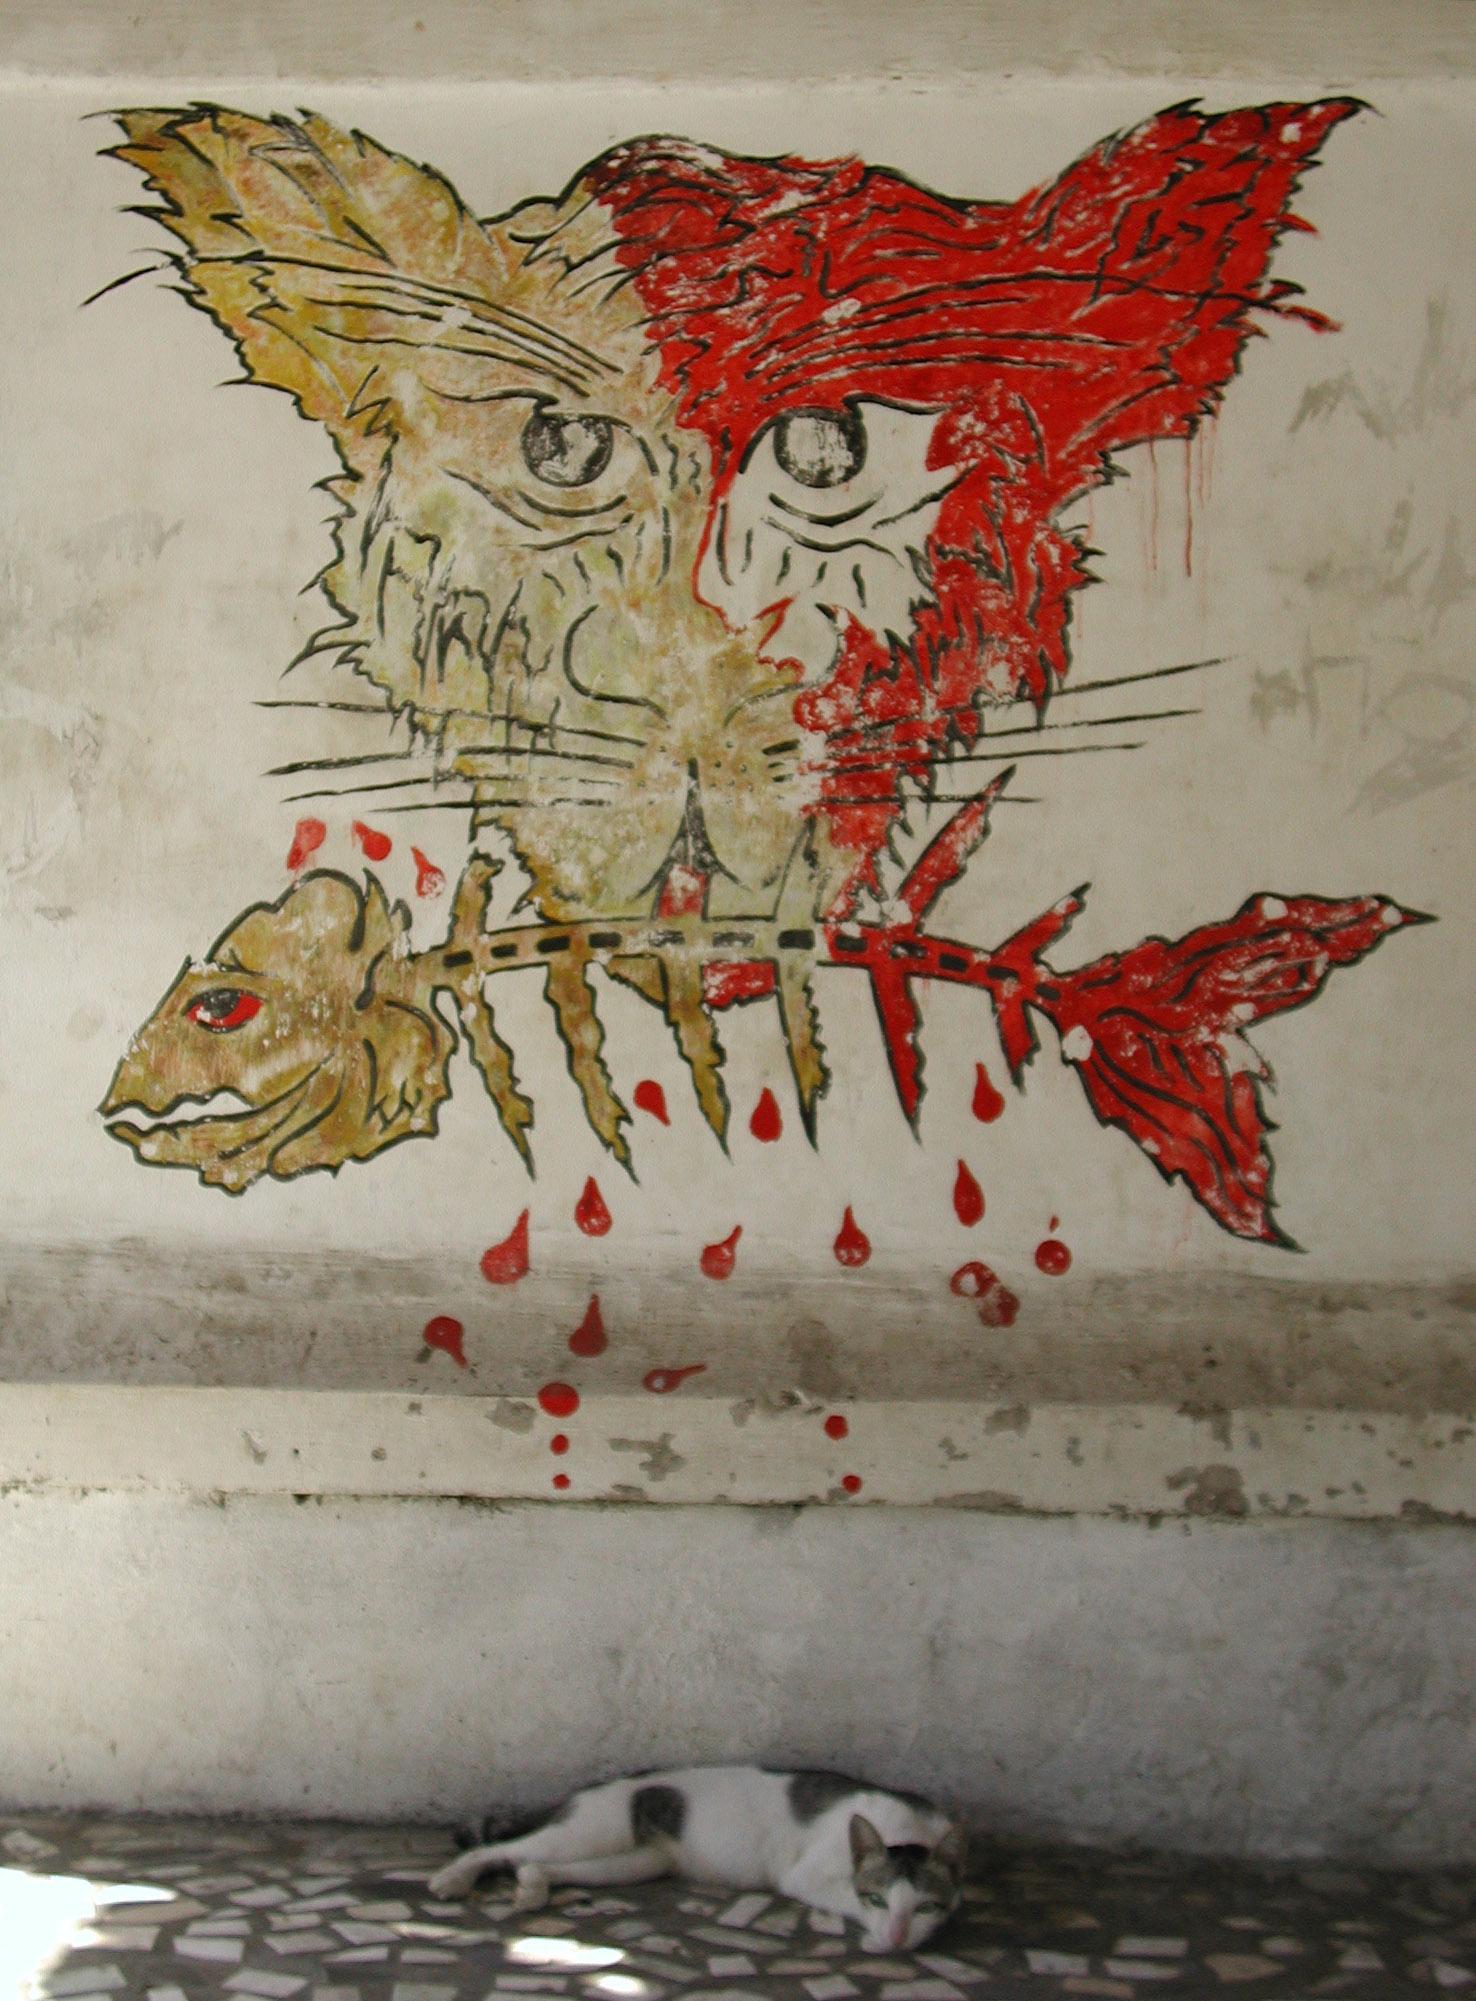 File:Street Art in Pad...